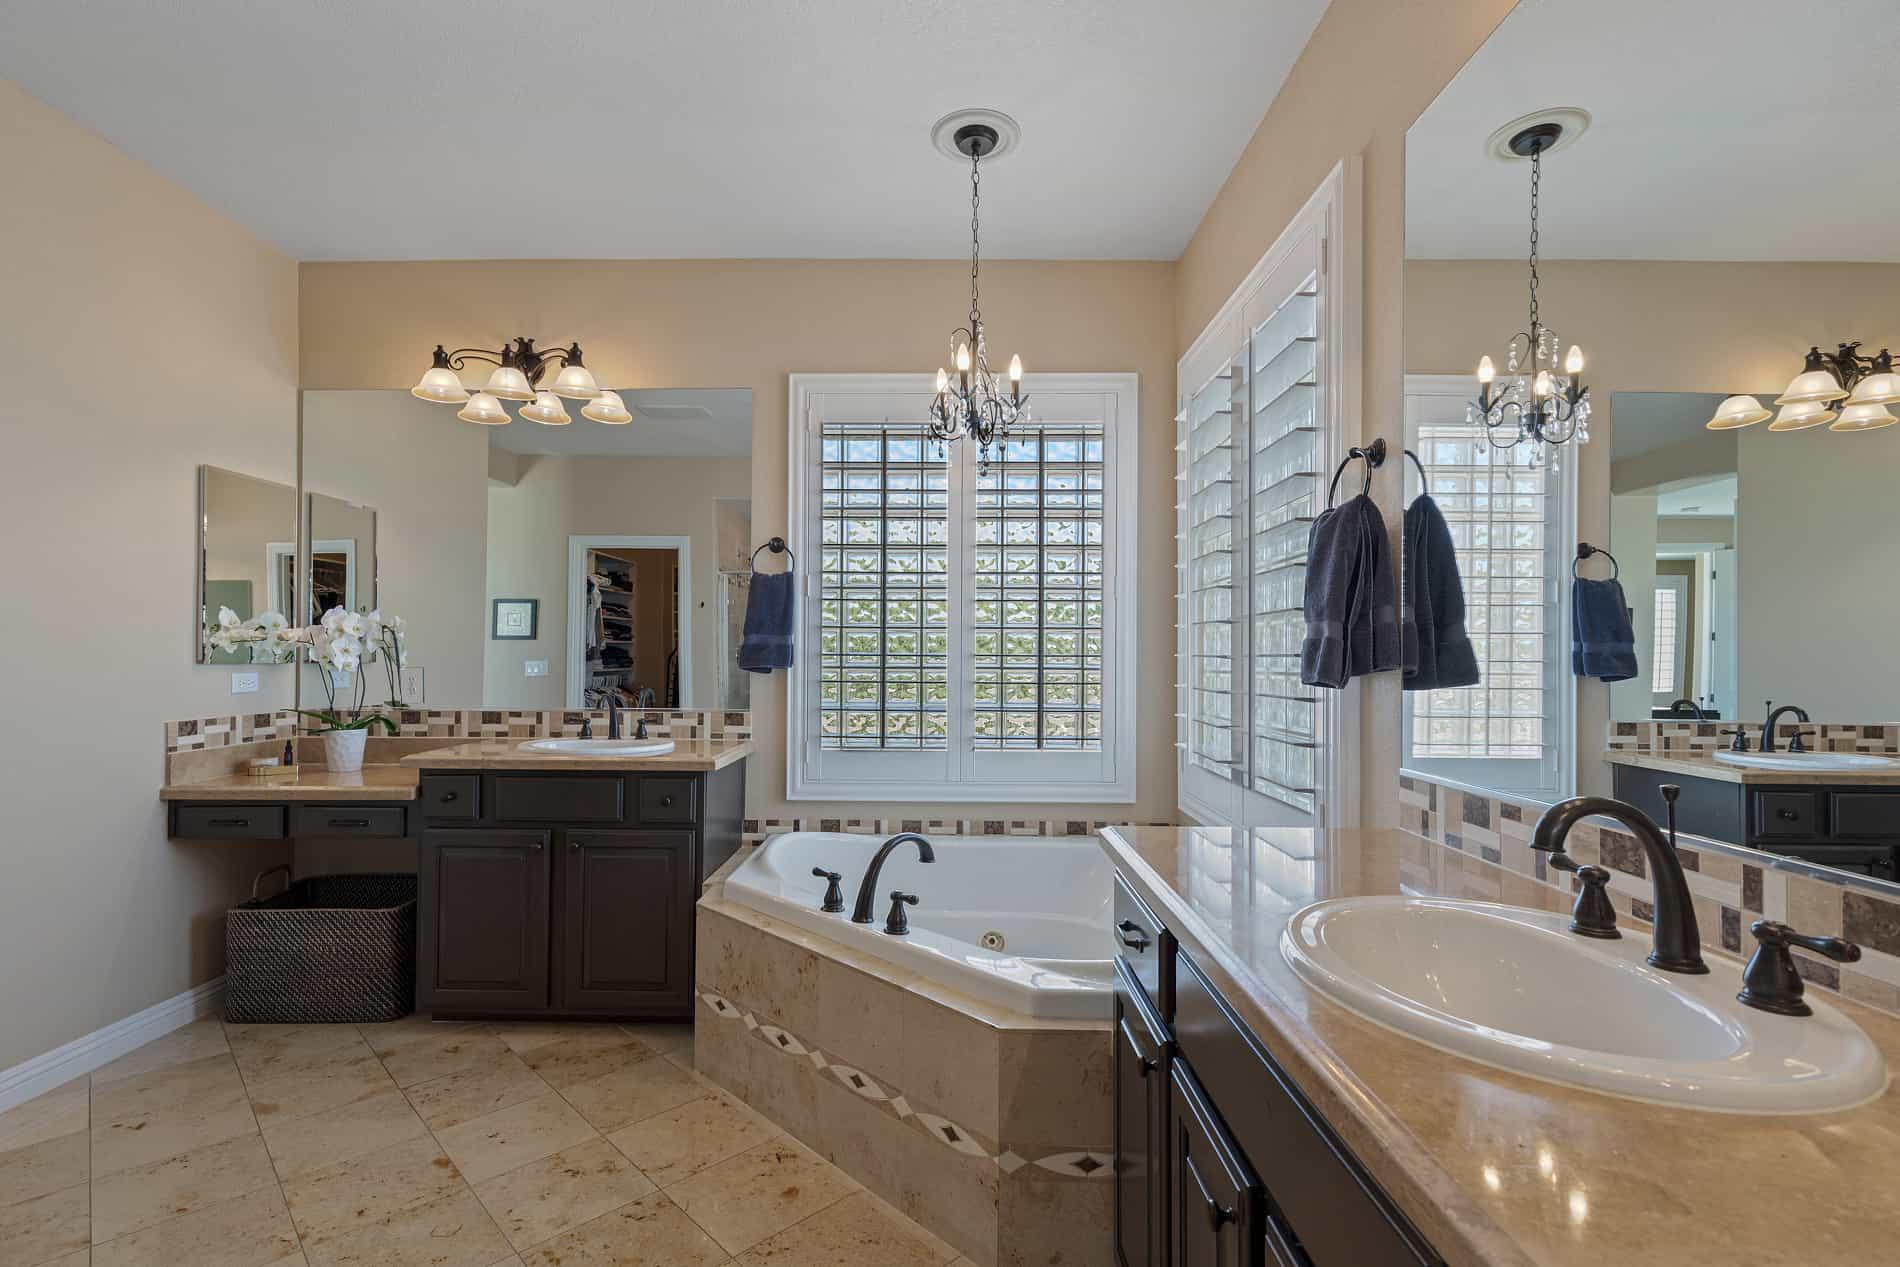 las-vegas-luxry-real-estate-realtor-rob-jensen-company-12108-vista-linda-avenue-the-paseos044